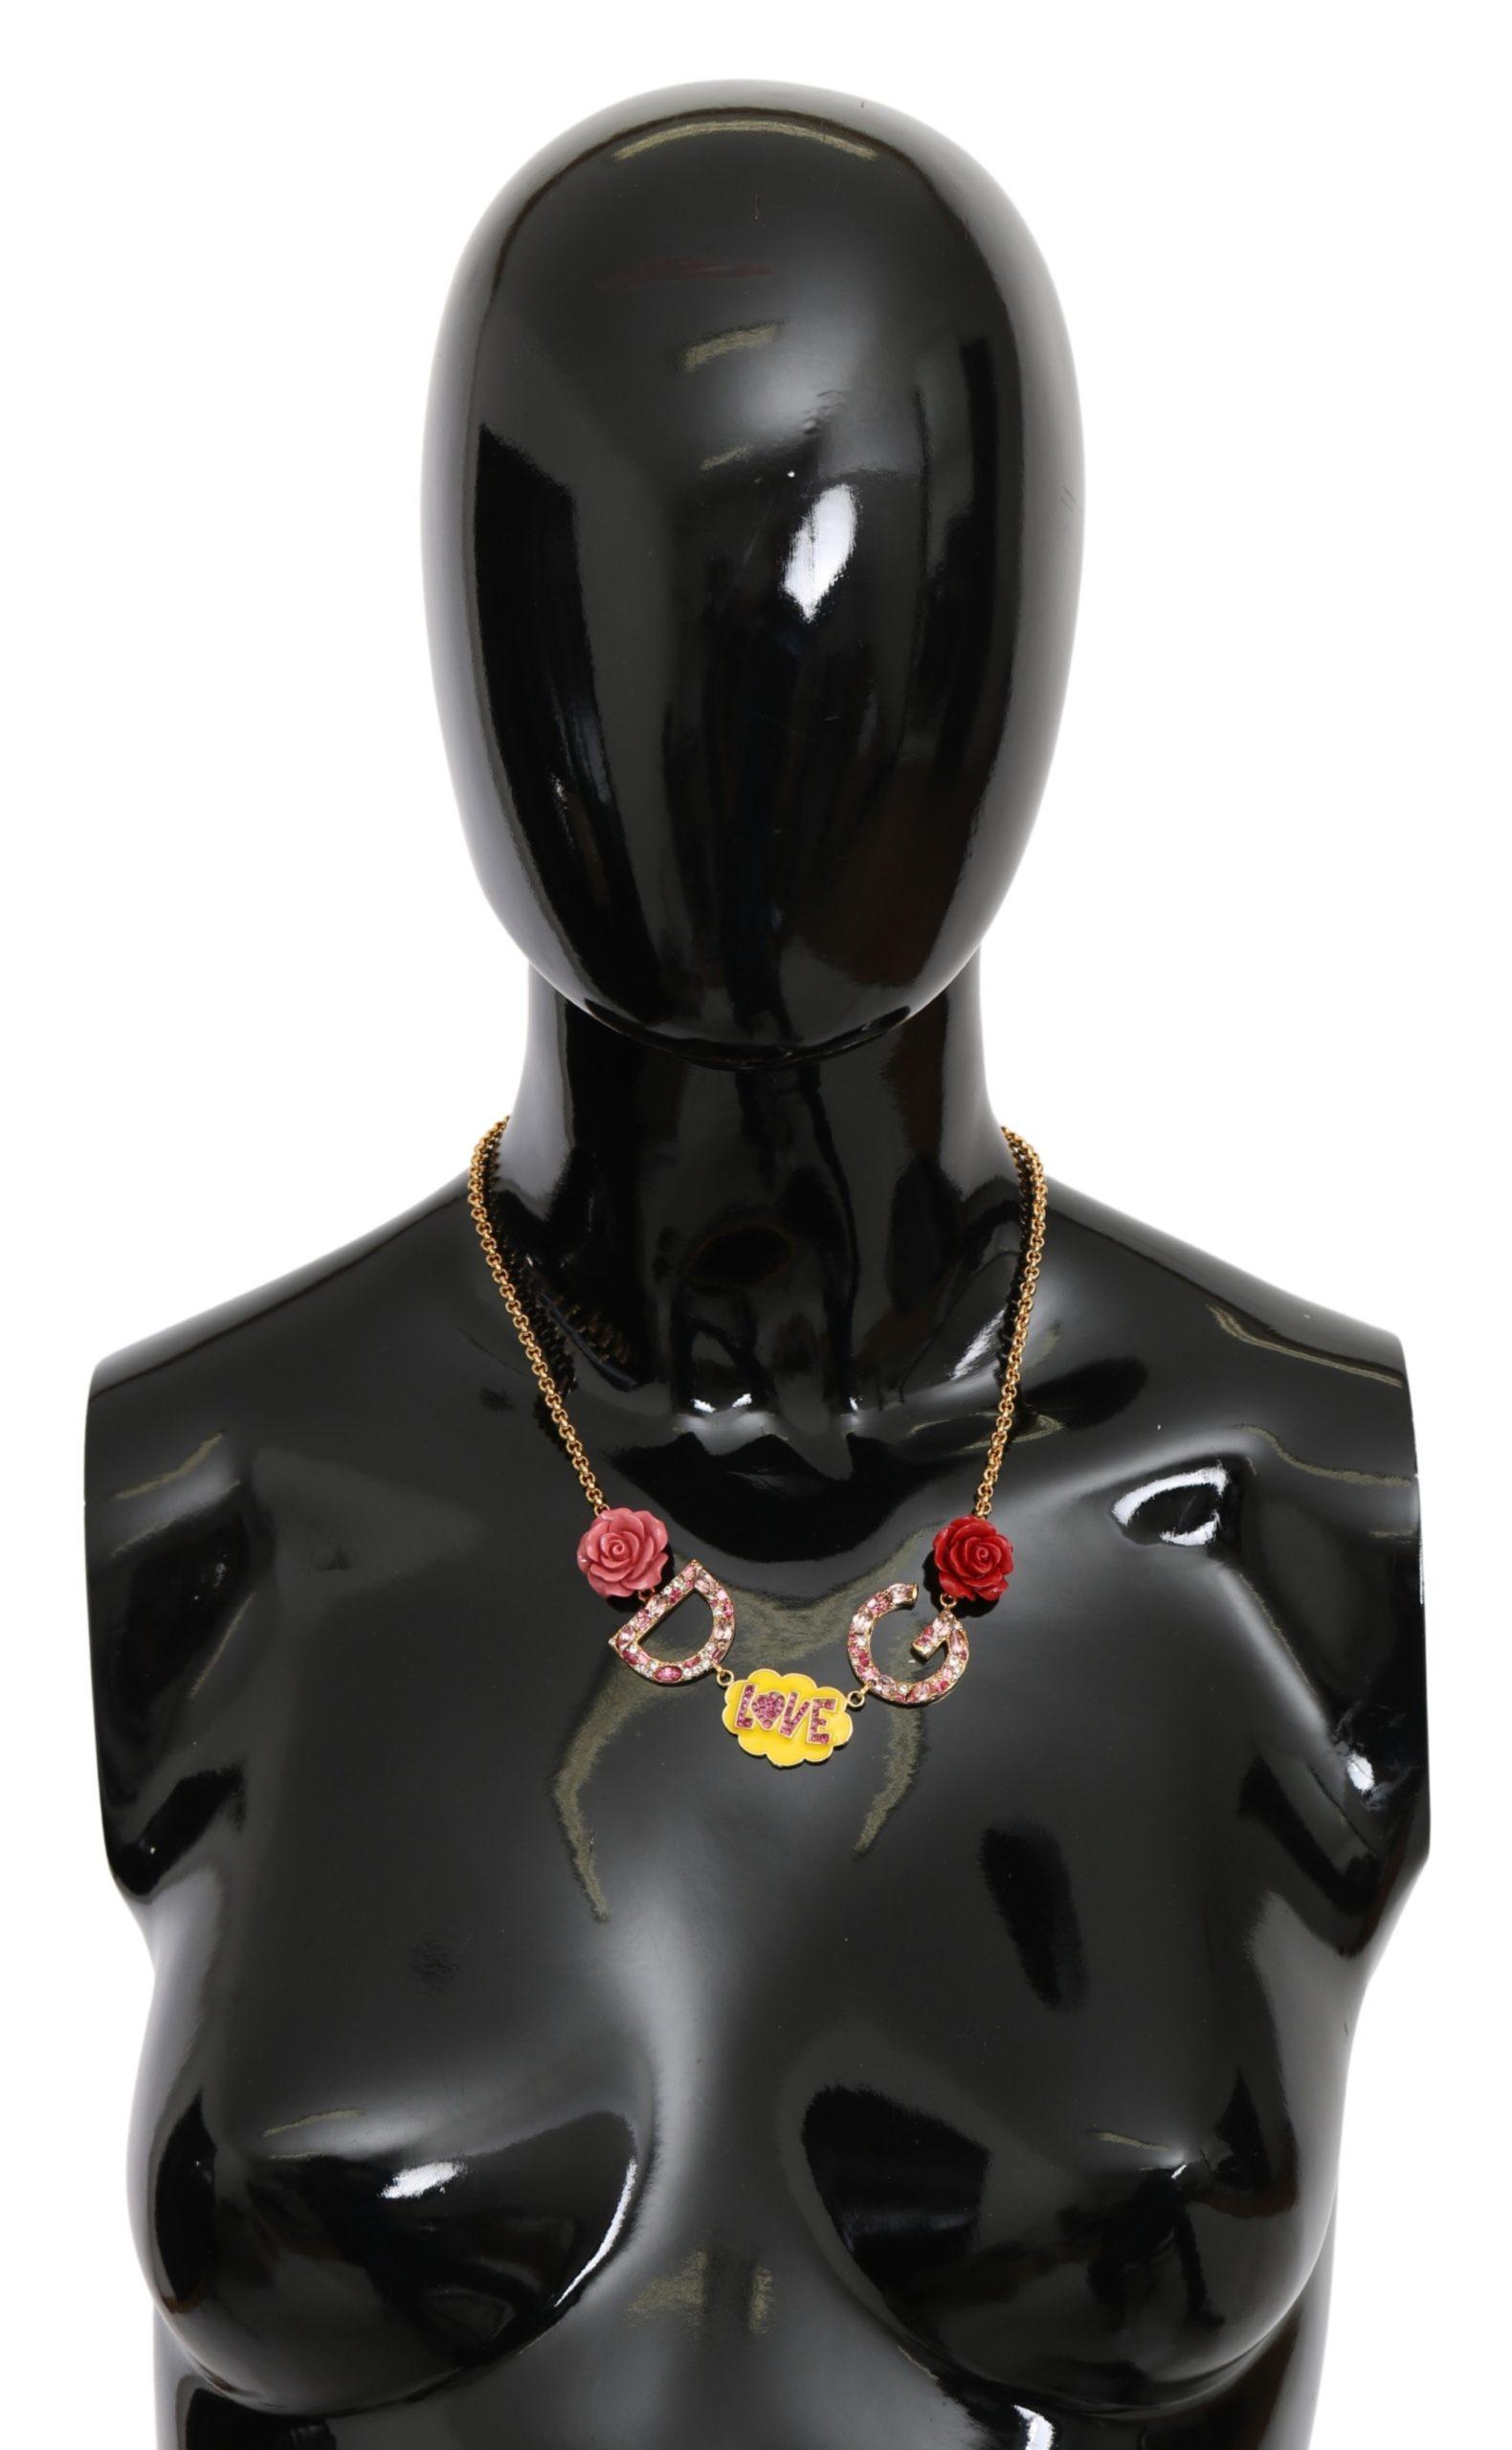 Dolce & Gabbana Women's Rose Love Crystal Charm Necklace Gold SMY7155